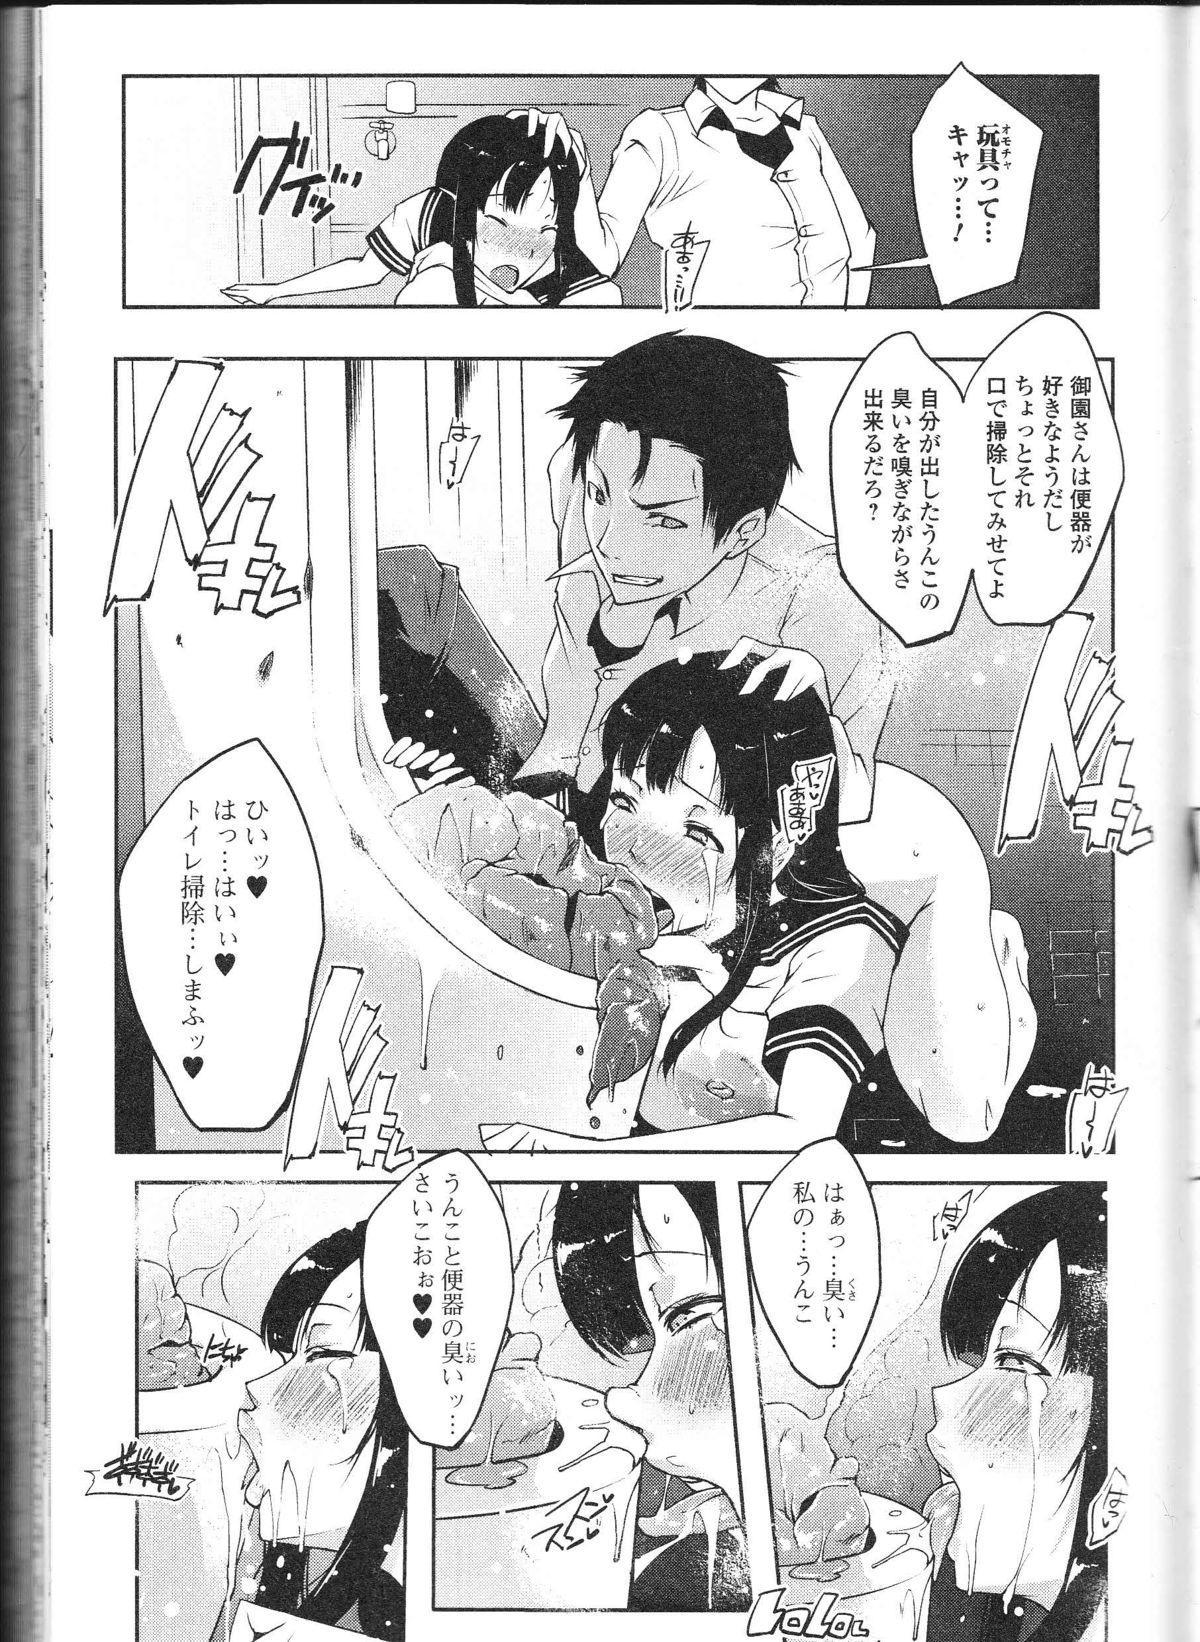 Nozoite wa Ikenai 9 - Do Not Peep! 9 77